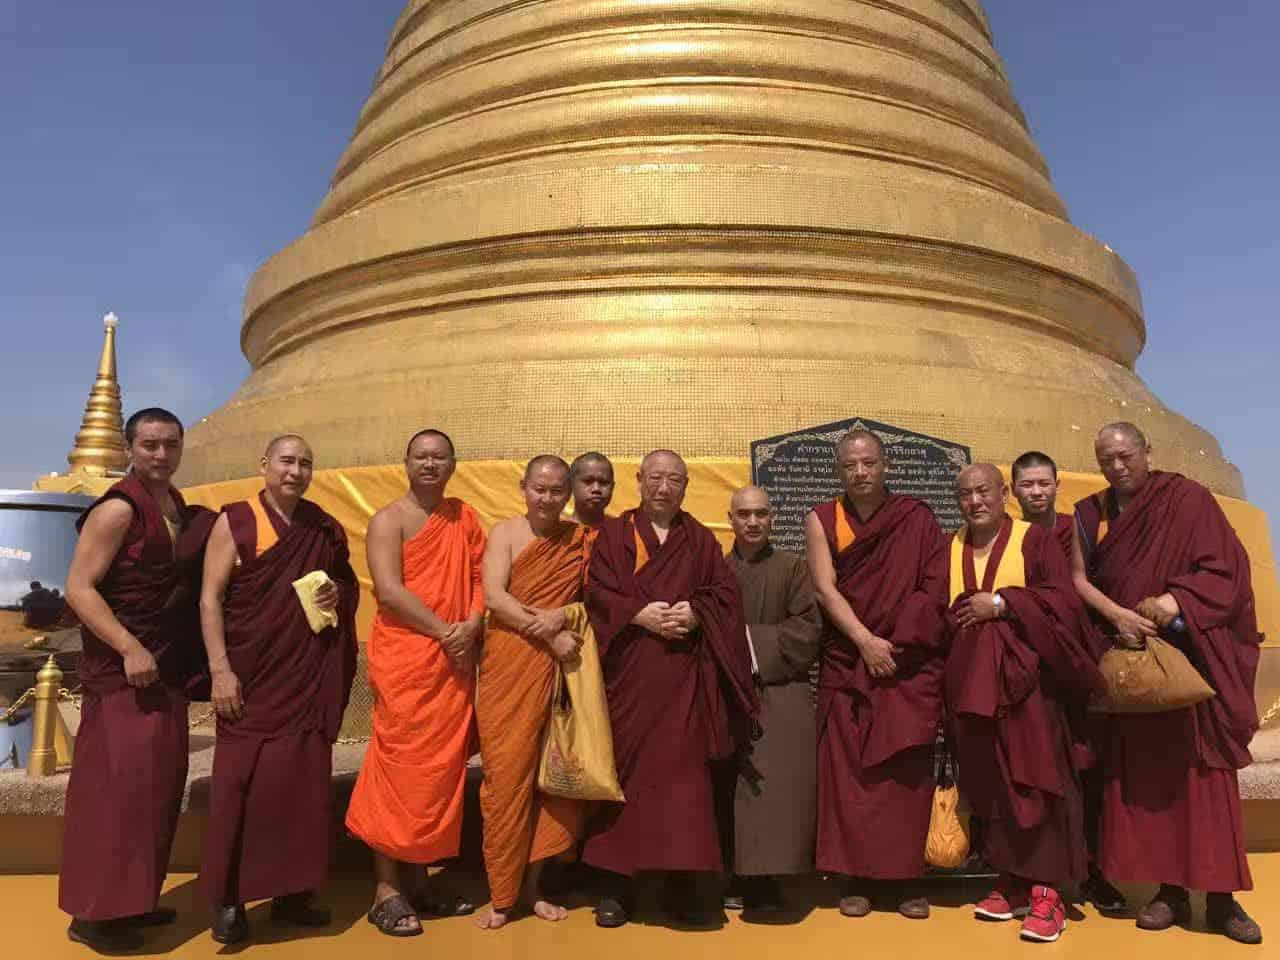 Gosok Rinpoche Thailand 2017 T025 1d6c8437b573f2d150df6108a9e02e4